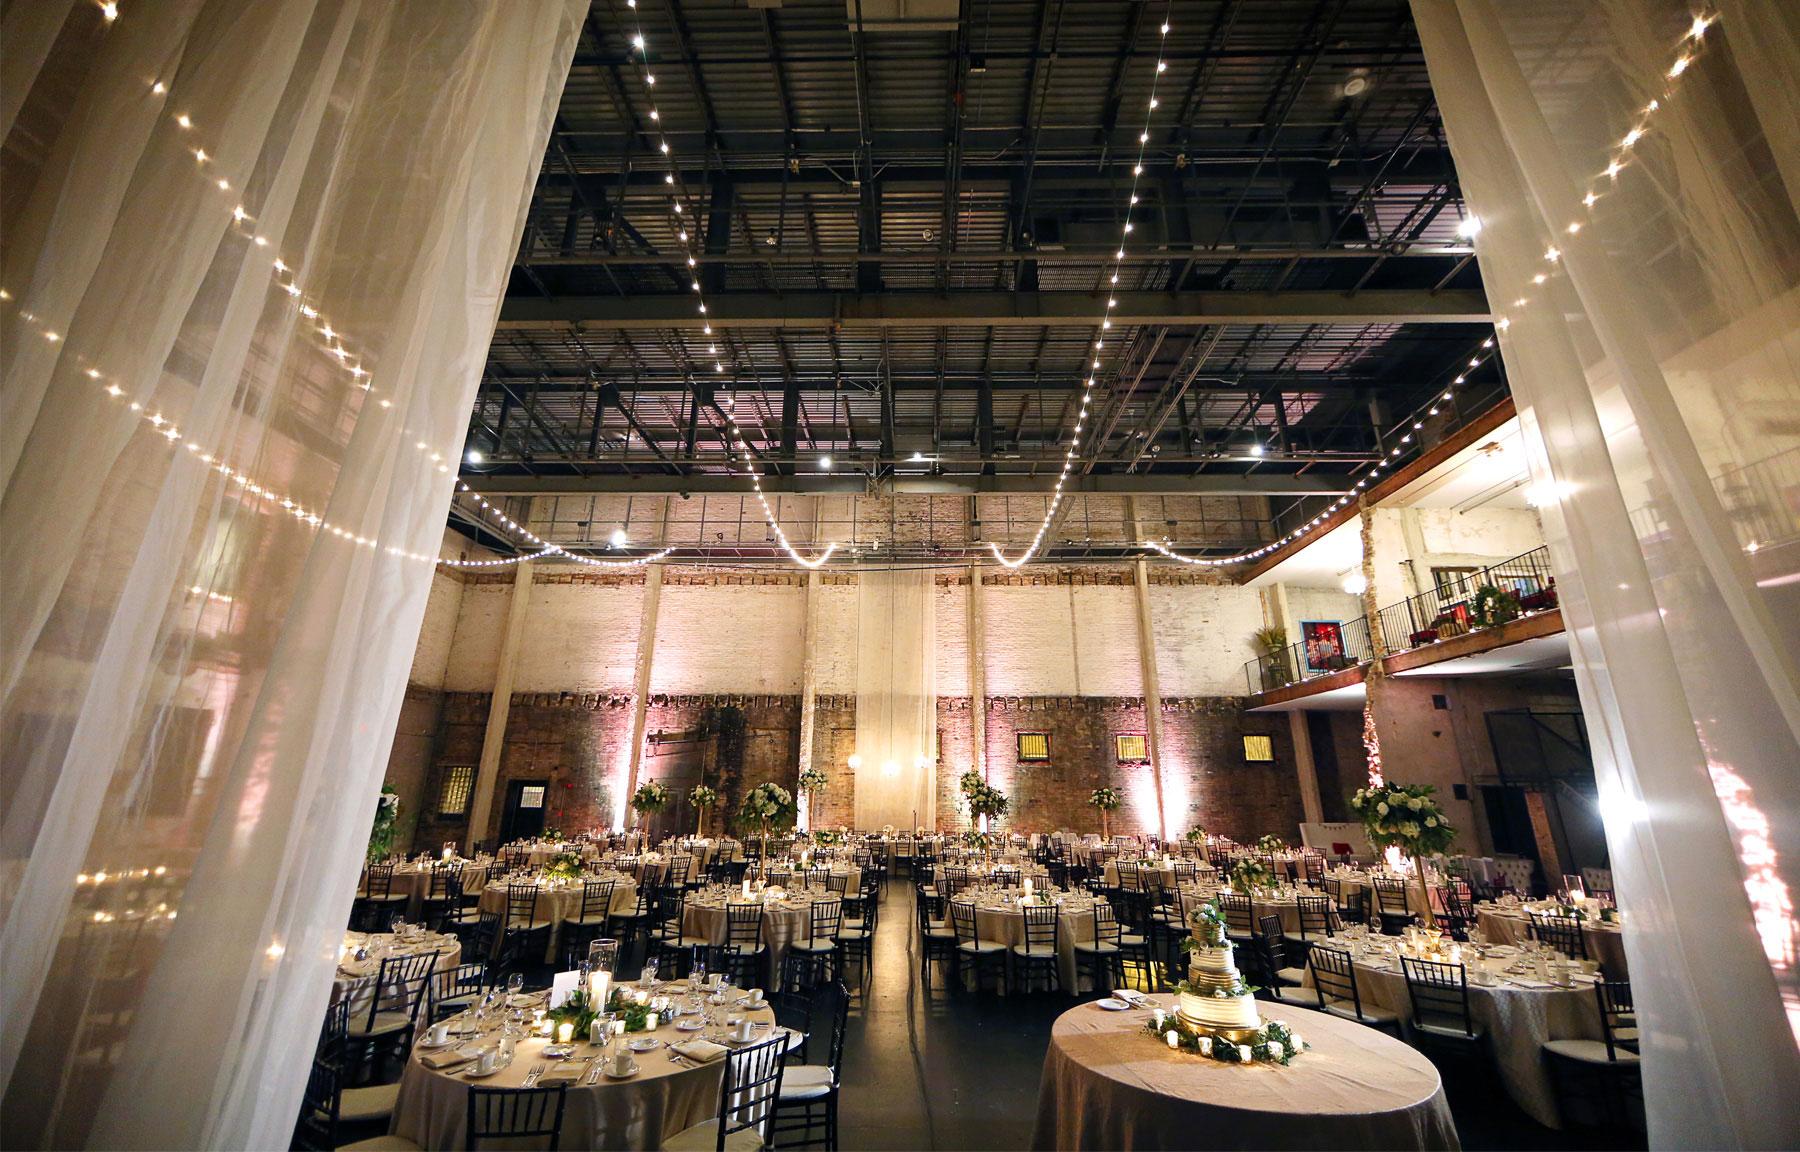 17-Minneapolis-Minnesota-Wedding-Photography-by-Vick-Photography-Aria-Decor-Reception-Caroline-and-J.jpg